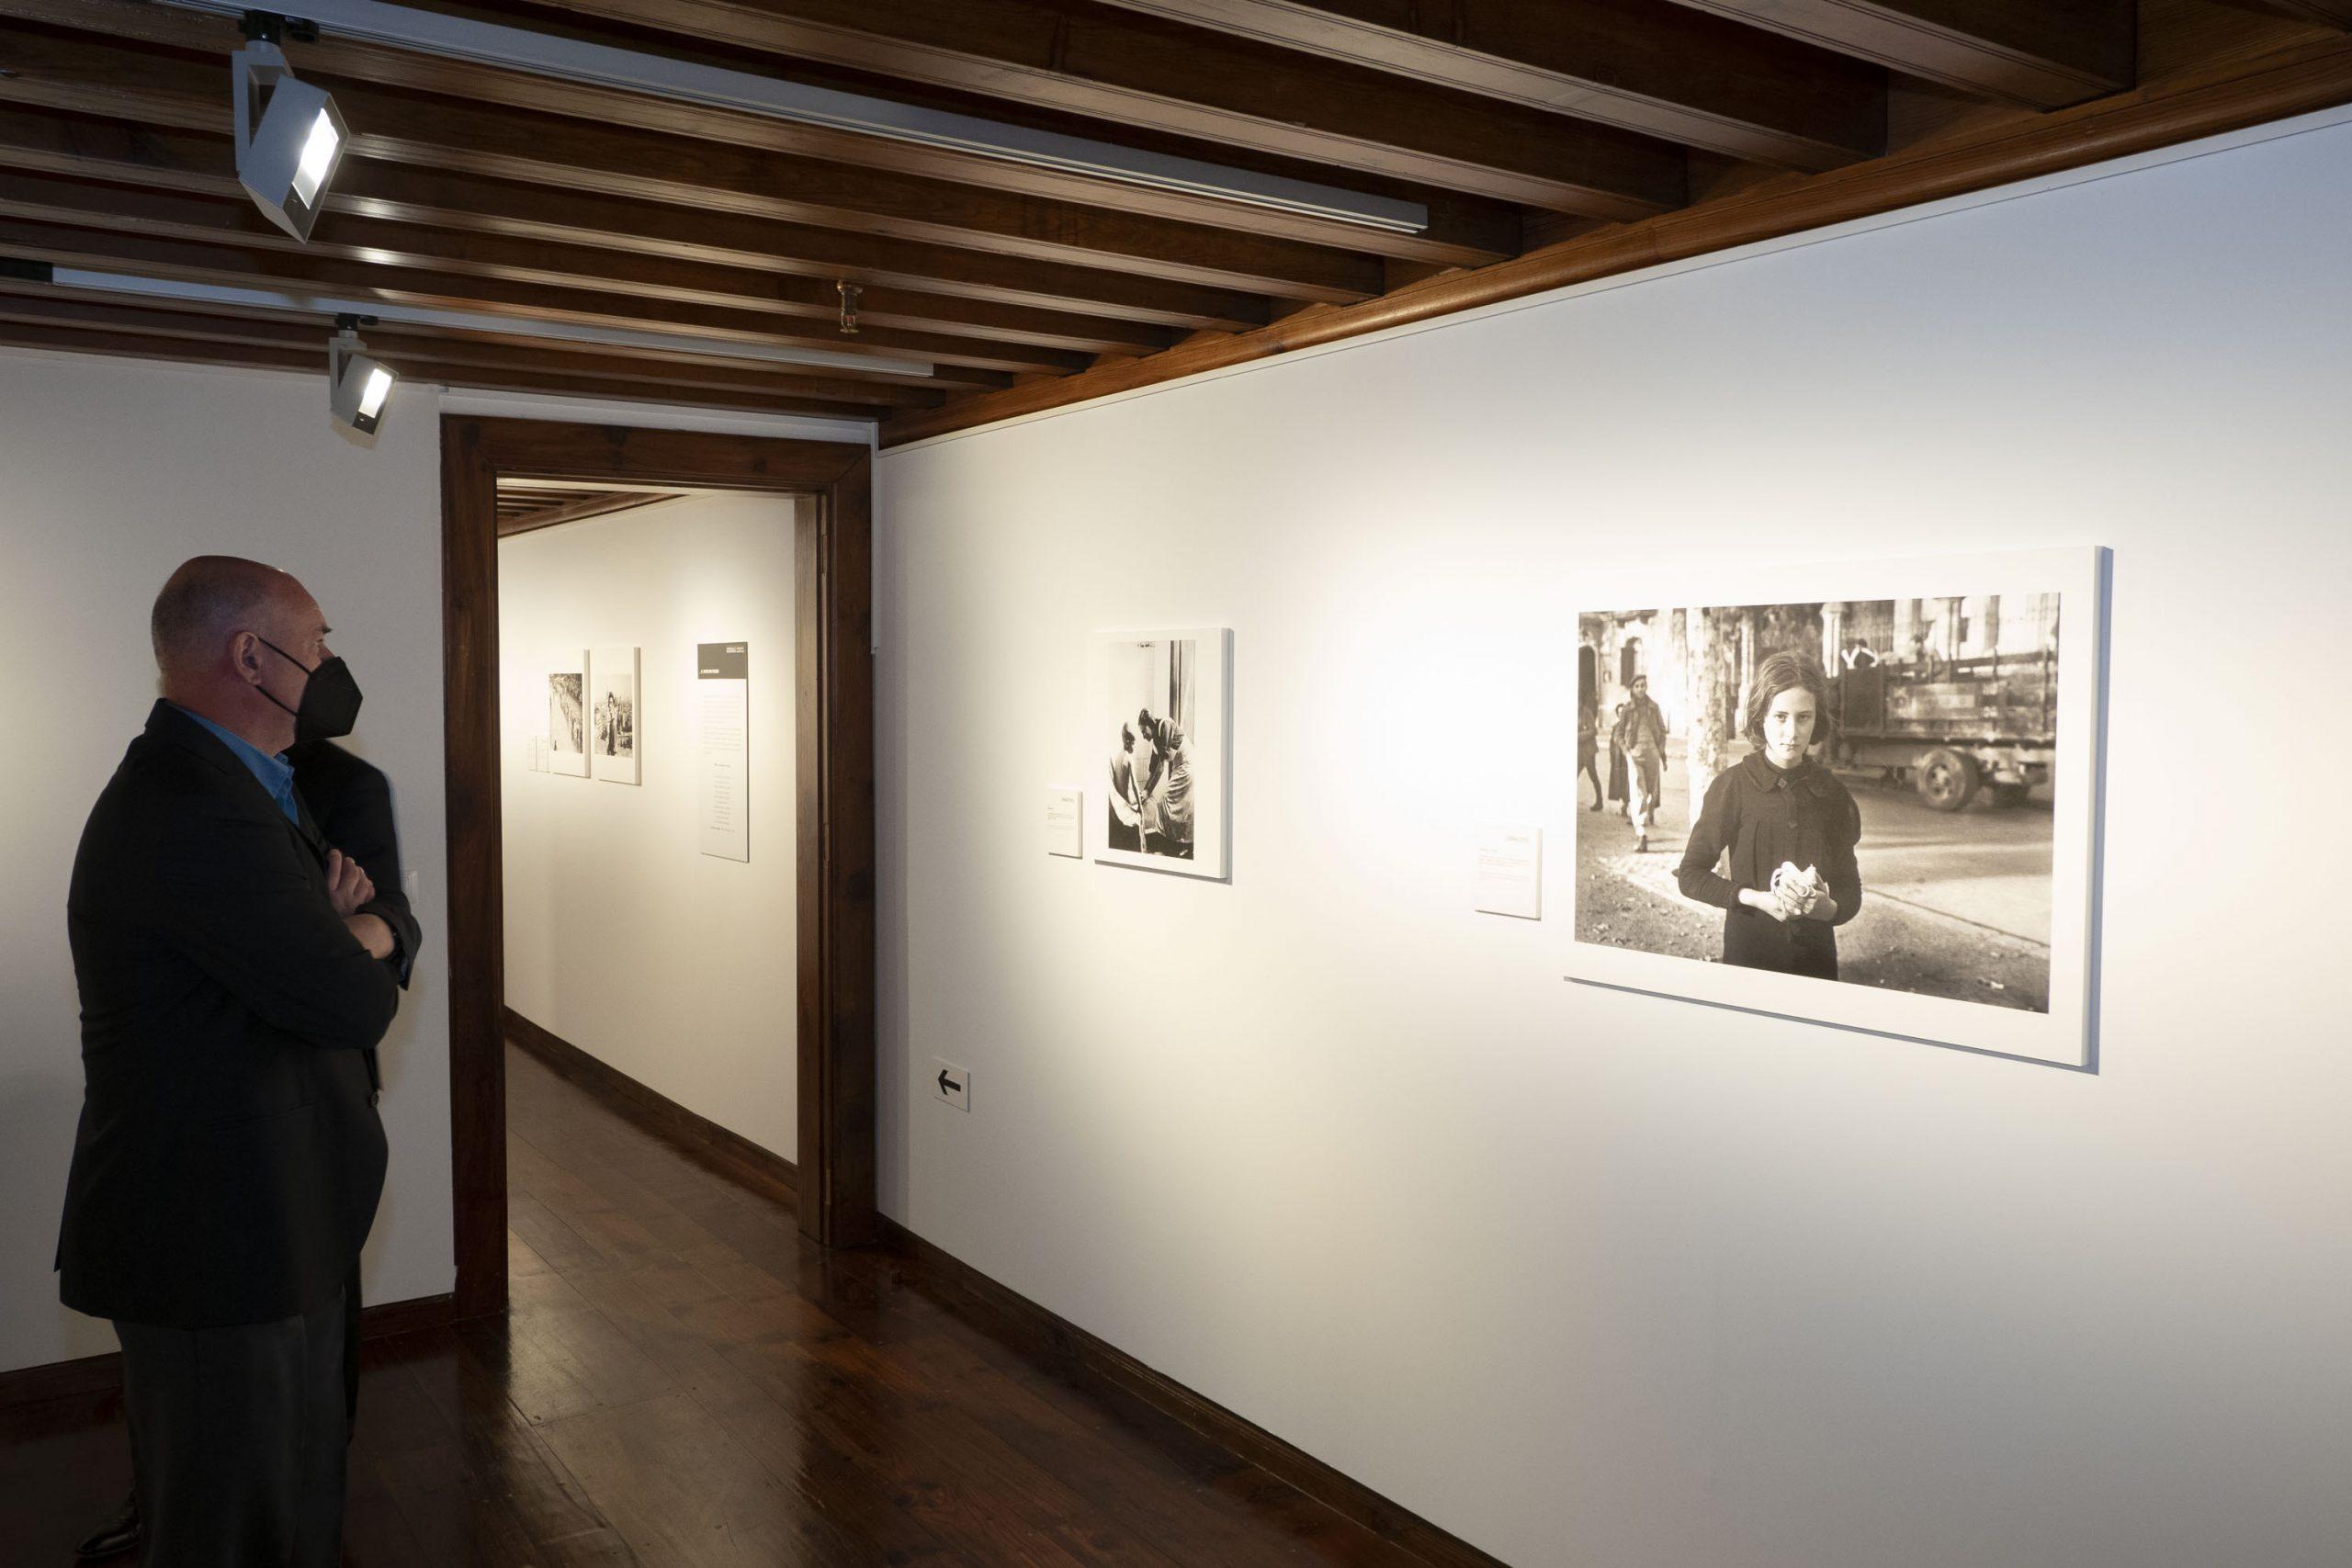 cb Exposicion Imagenes Ineditas de La Guerra Civil07 scaled